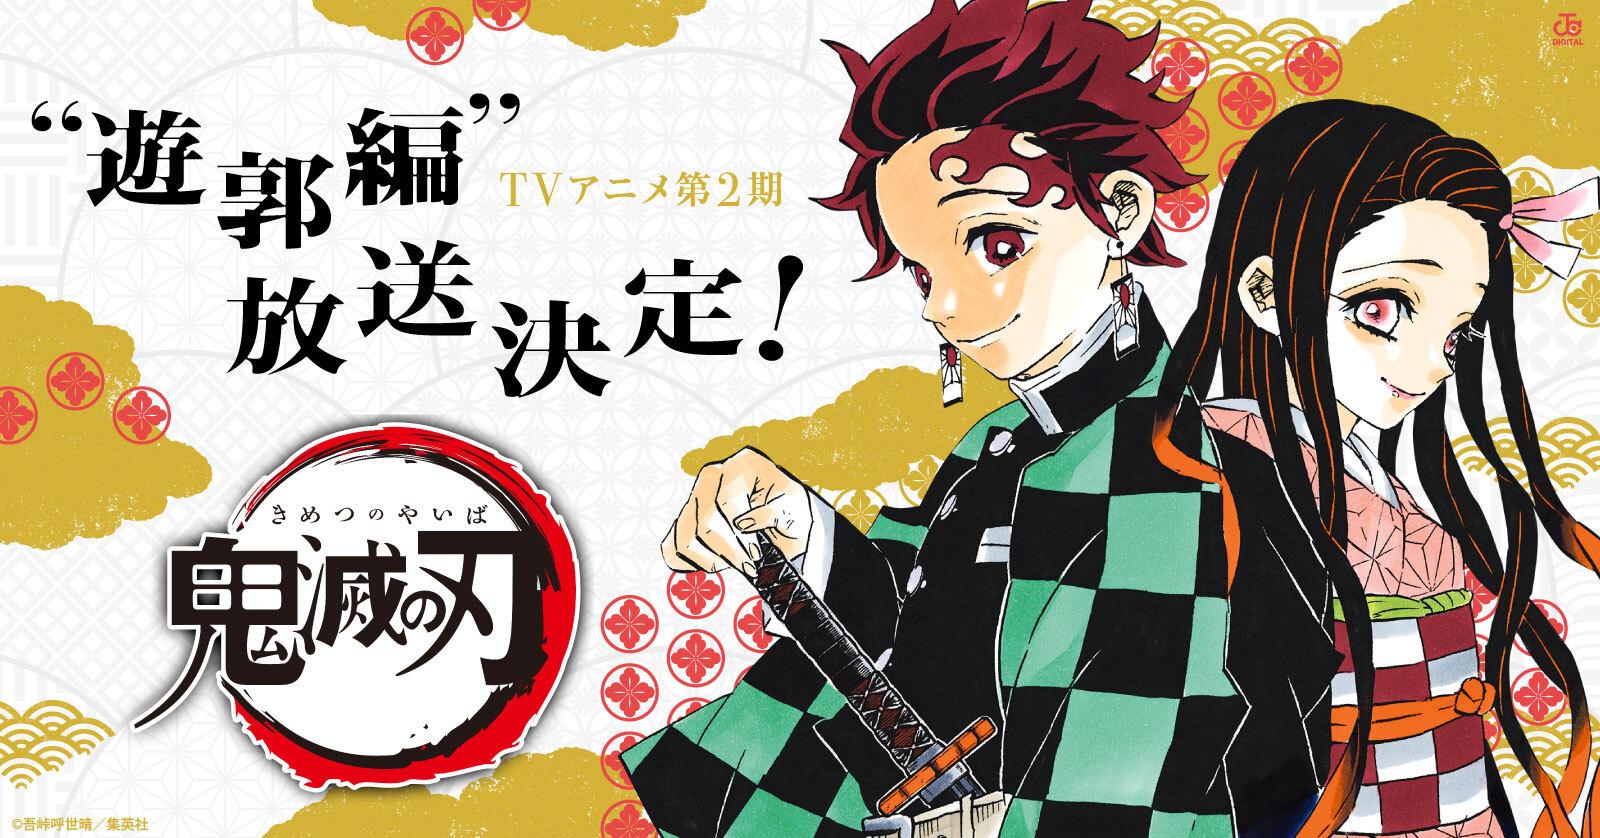 TVアニメ第2期、2021年放送決定!『鬼滅の刃』